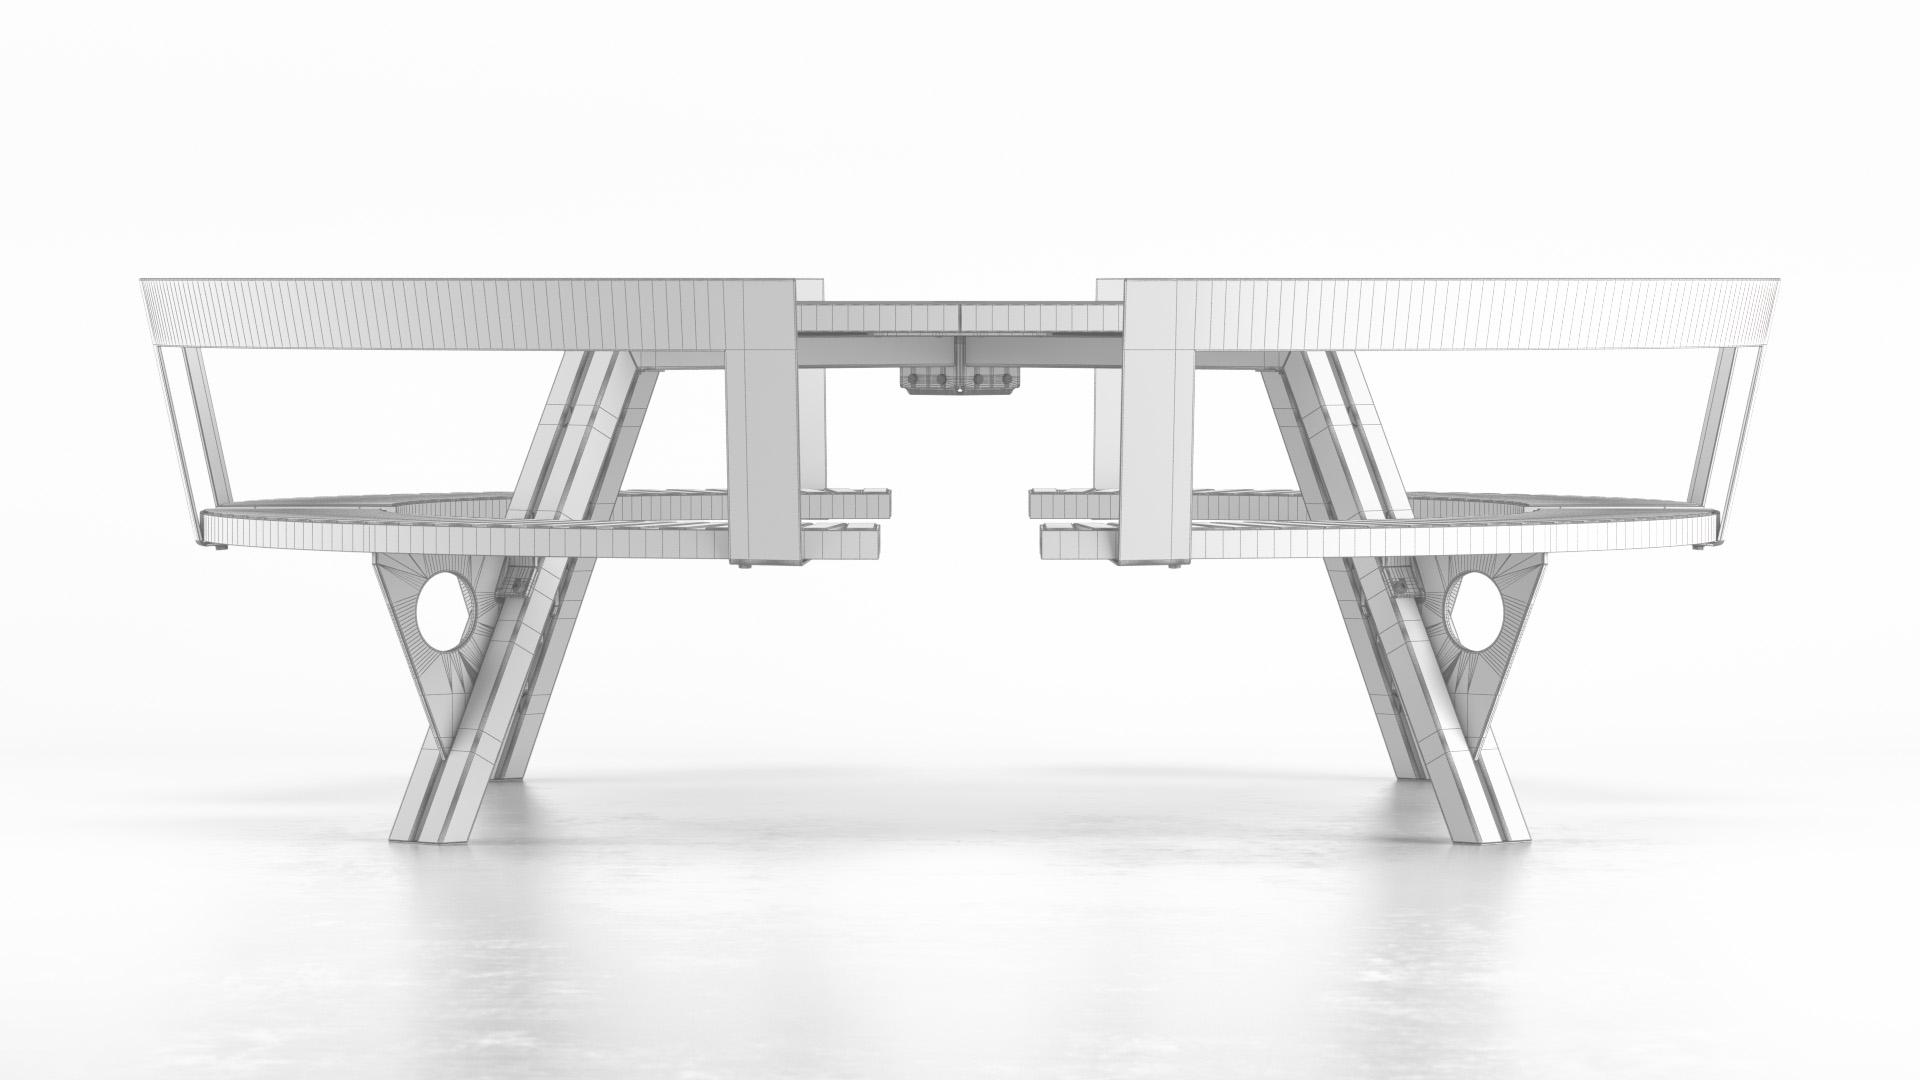 Gargantua_Table_Mode3_WhiteSet_01_wire_0002